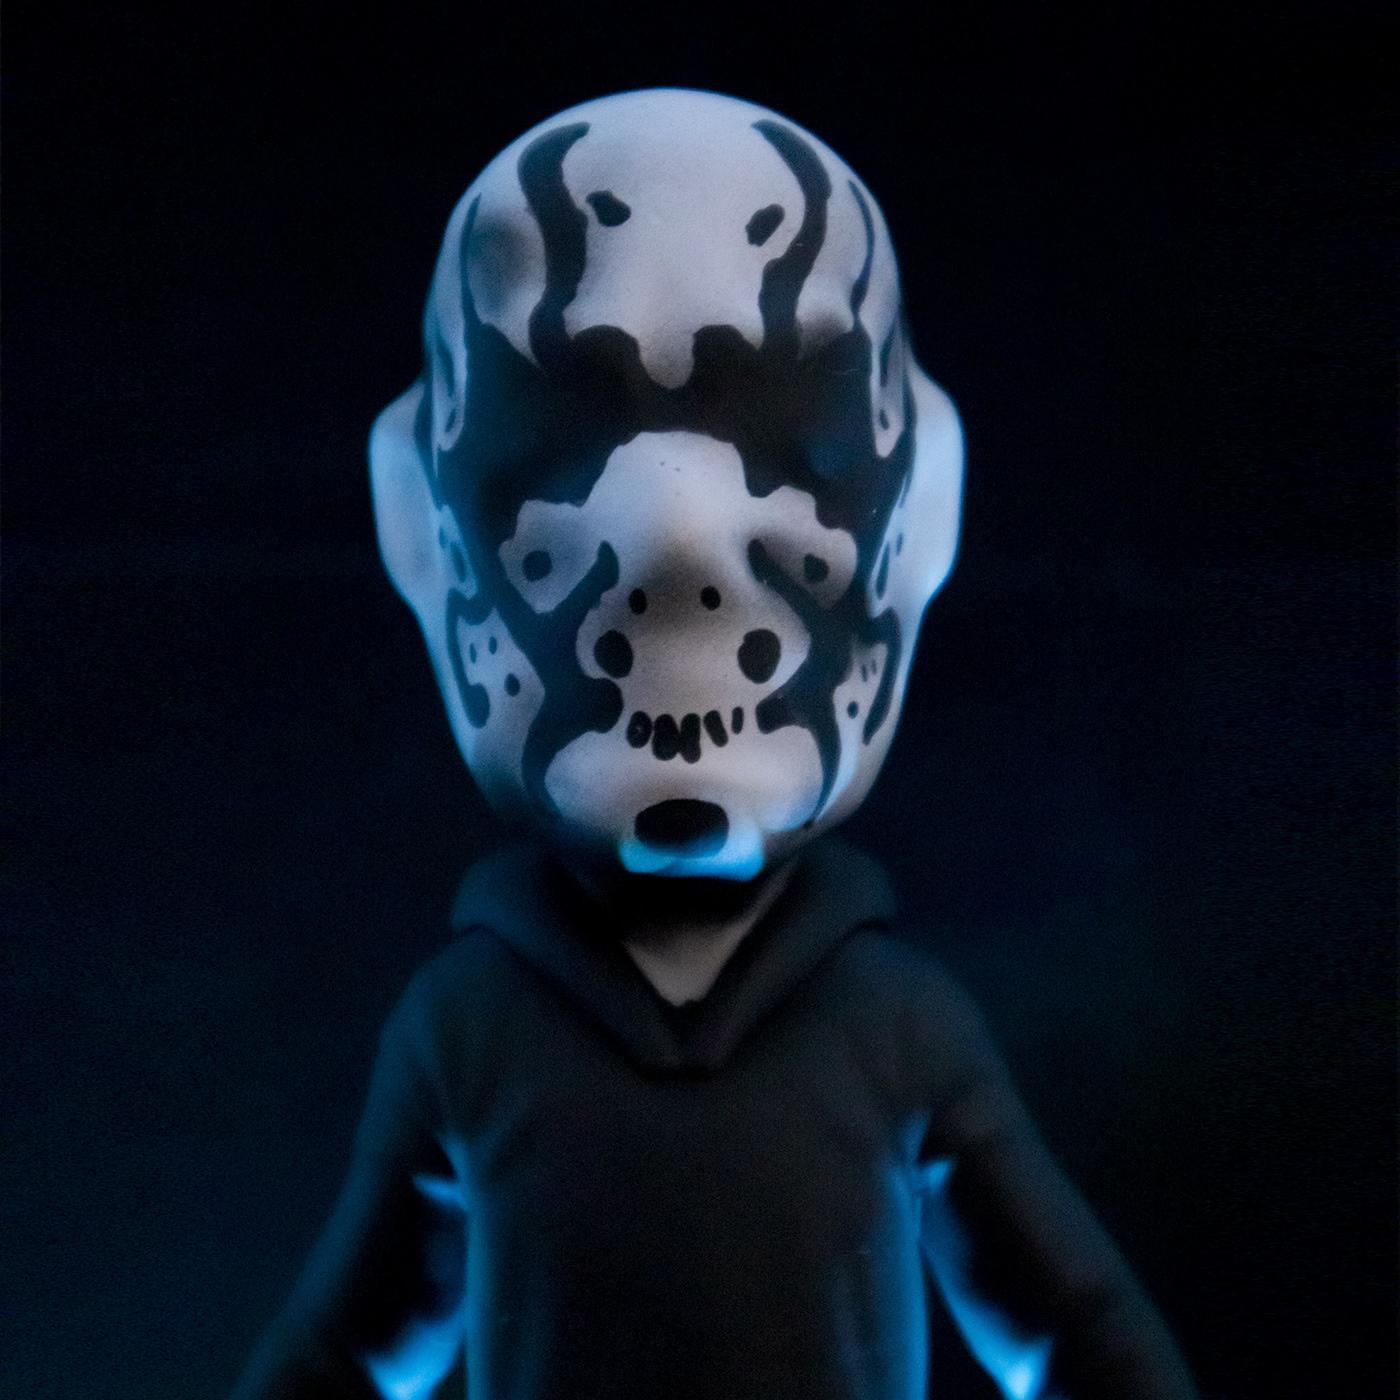 Image may contain: skull